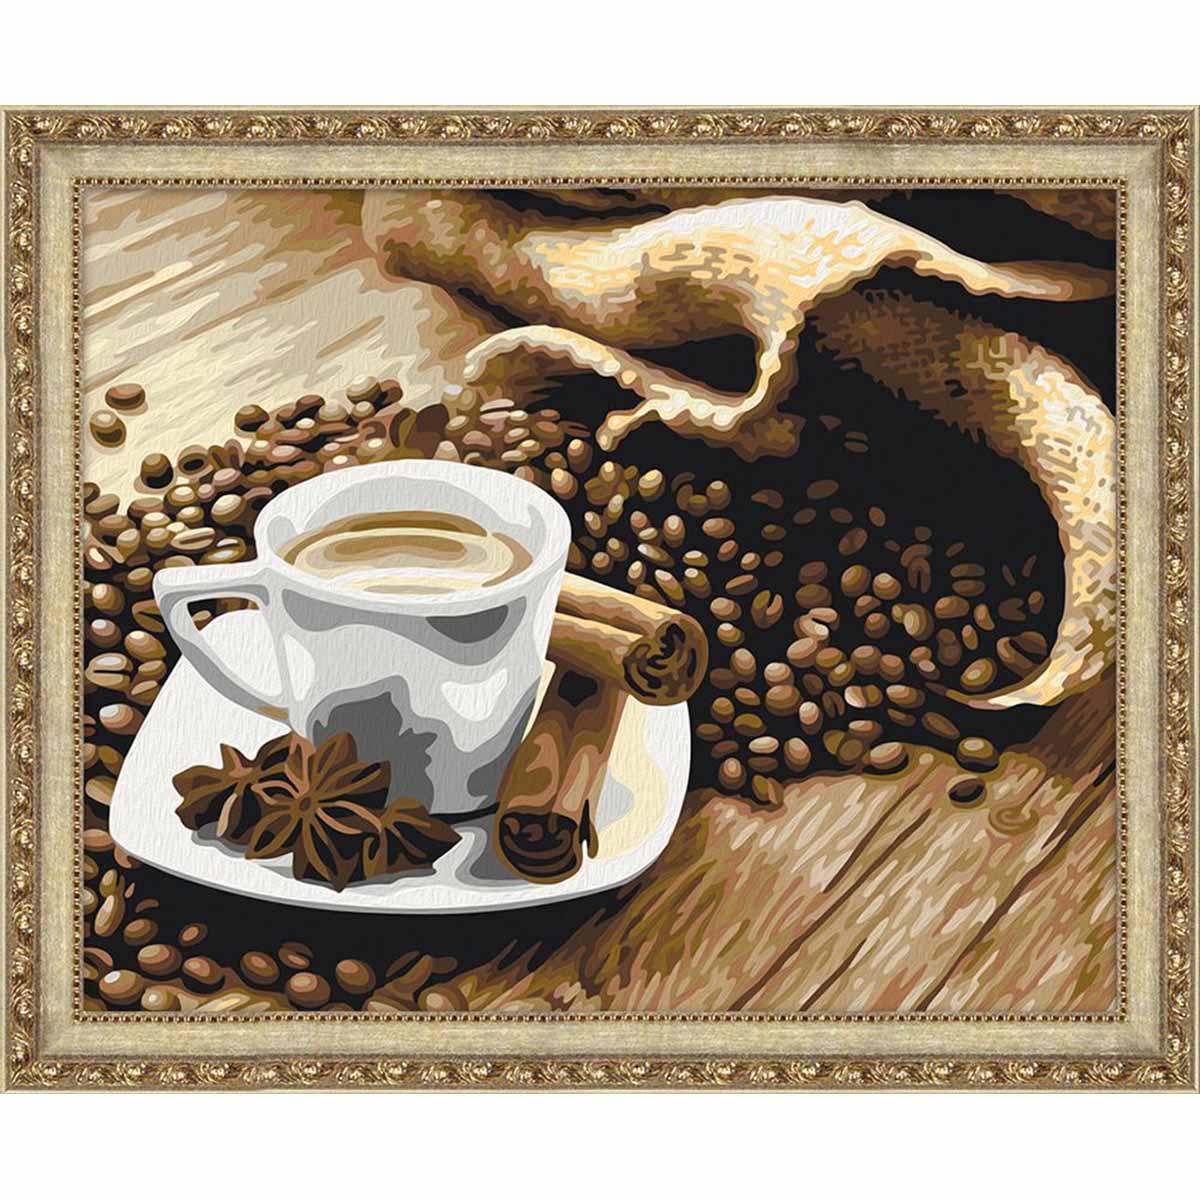 7С-0252 Картина по номерам 'Аромат кофе' 50*40см